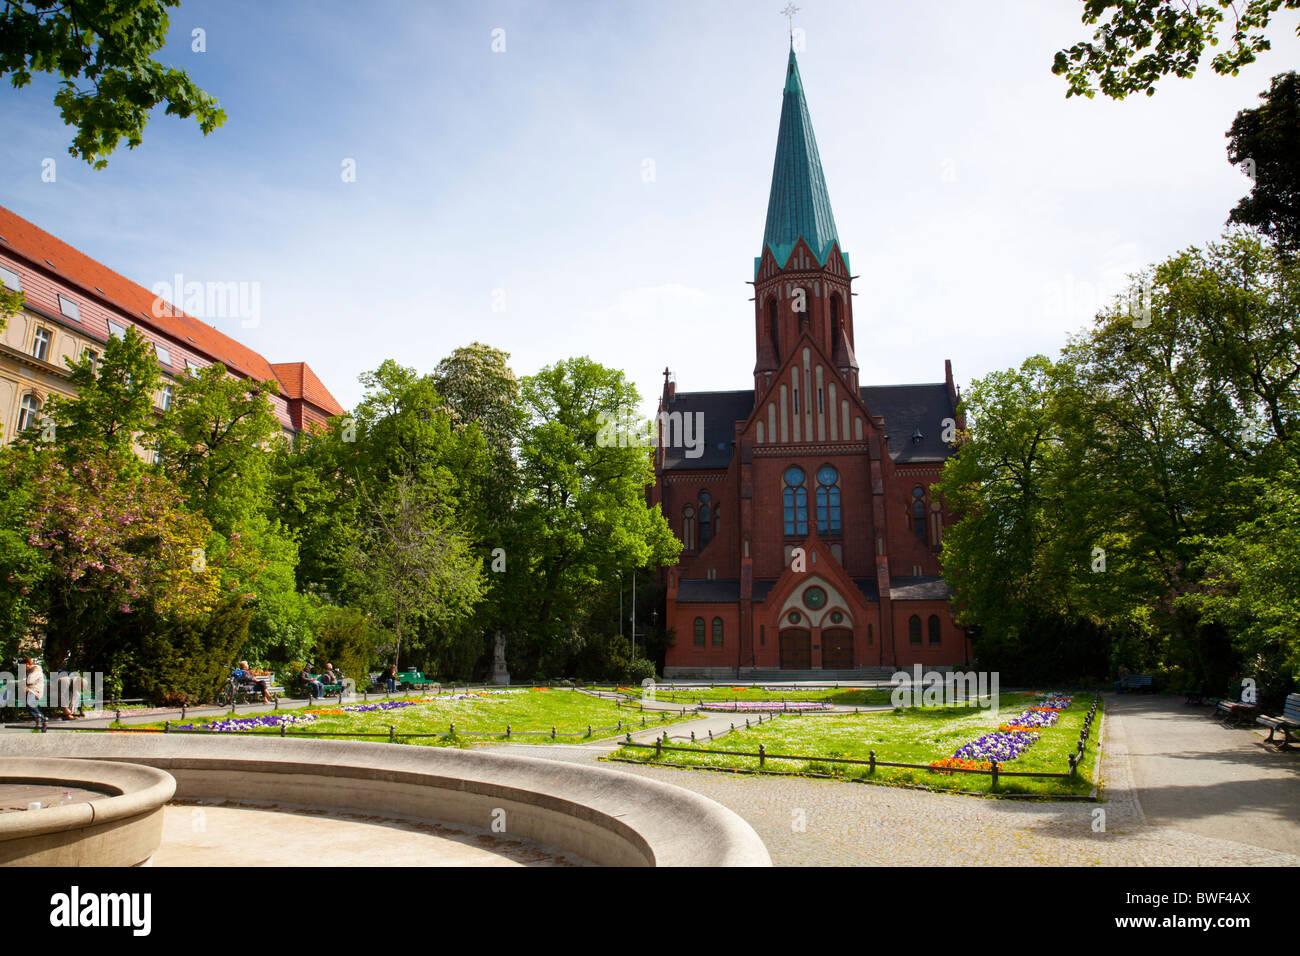 St. Ludwig Kirche (St Louis Church), Wilmersdorf, Berlin Germany - Stock Image